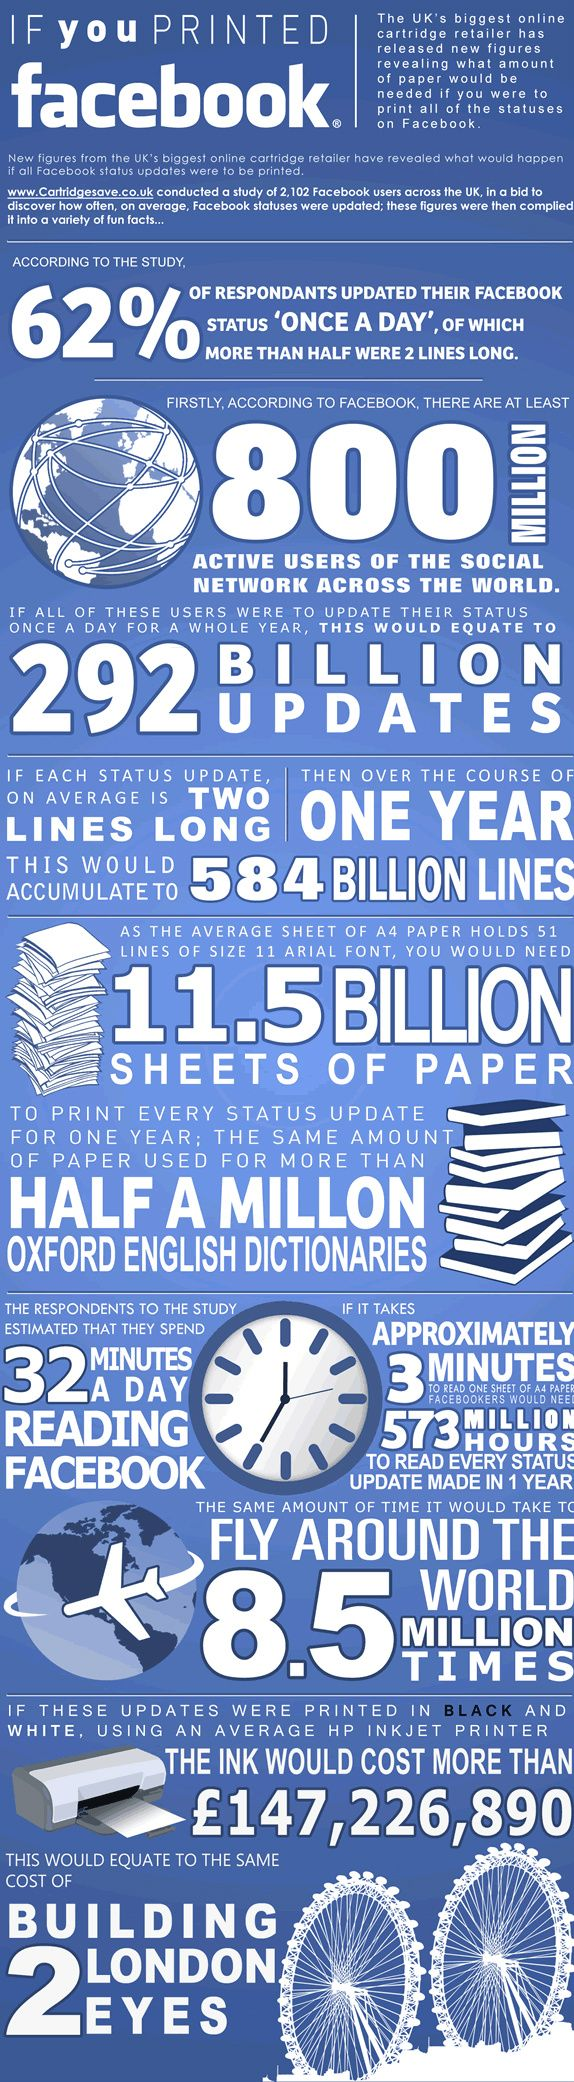 Lot of paper...Digital Marketing, Infographic Socialmedia, Prints Facebook, Social Media, Media Infographic, Paper Infographic, Facebook Marketing, Facebook Infographic, Billion Sheet